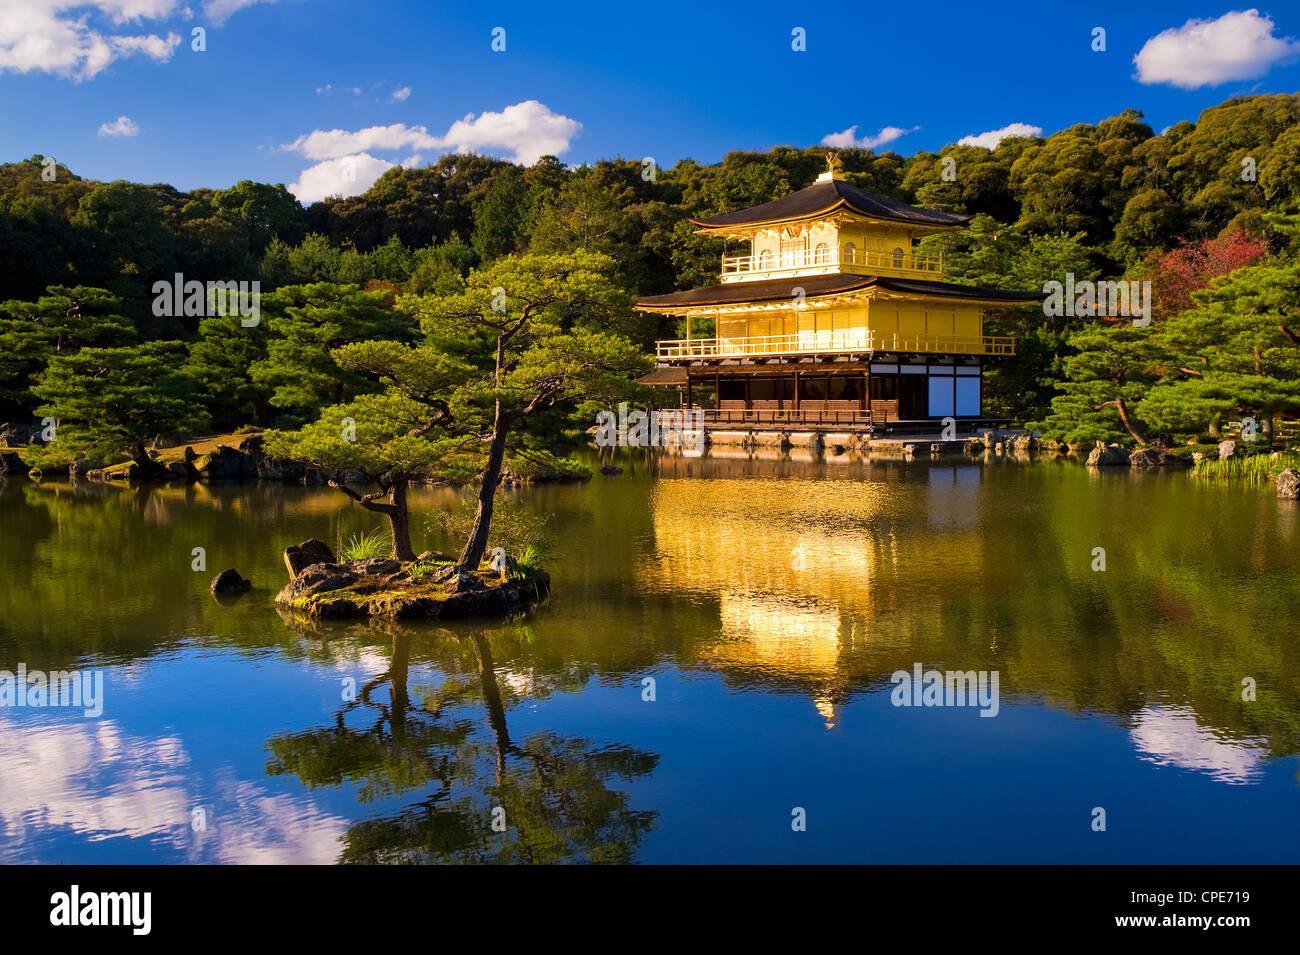 Kinkaku-Ji (Tempel des goldenen Pavillons), Kyoto, Japan, Asien Stockbild